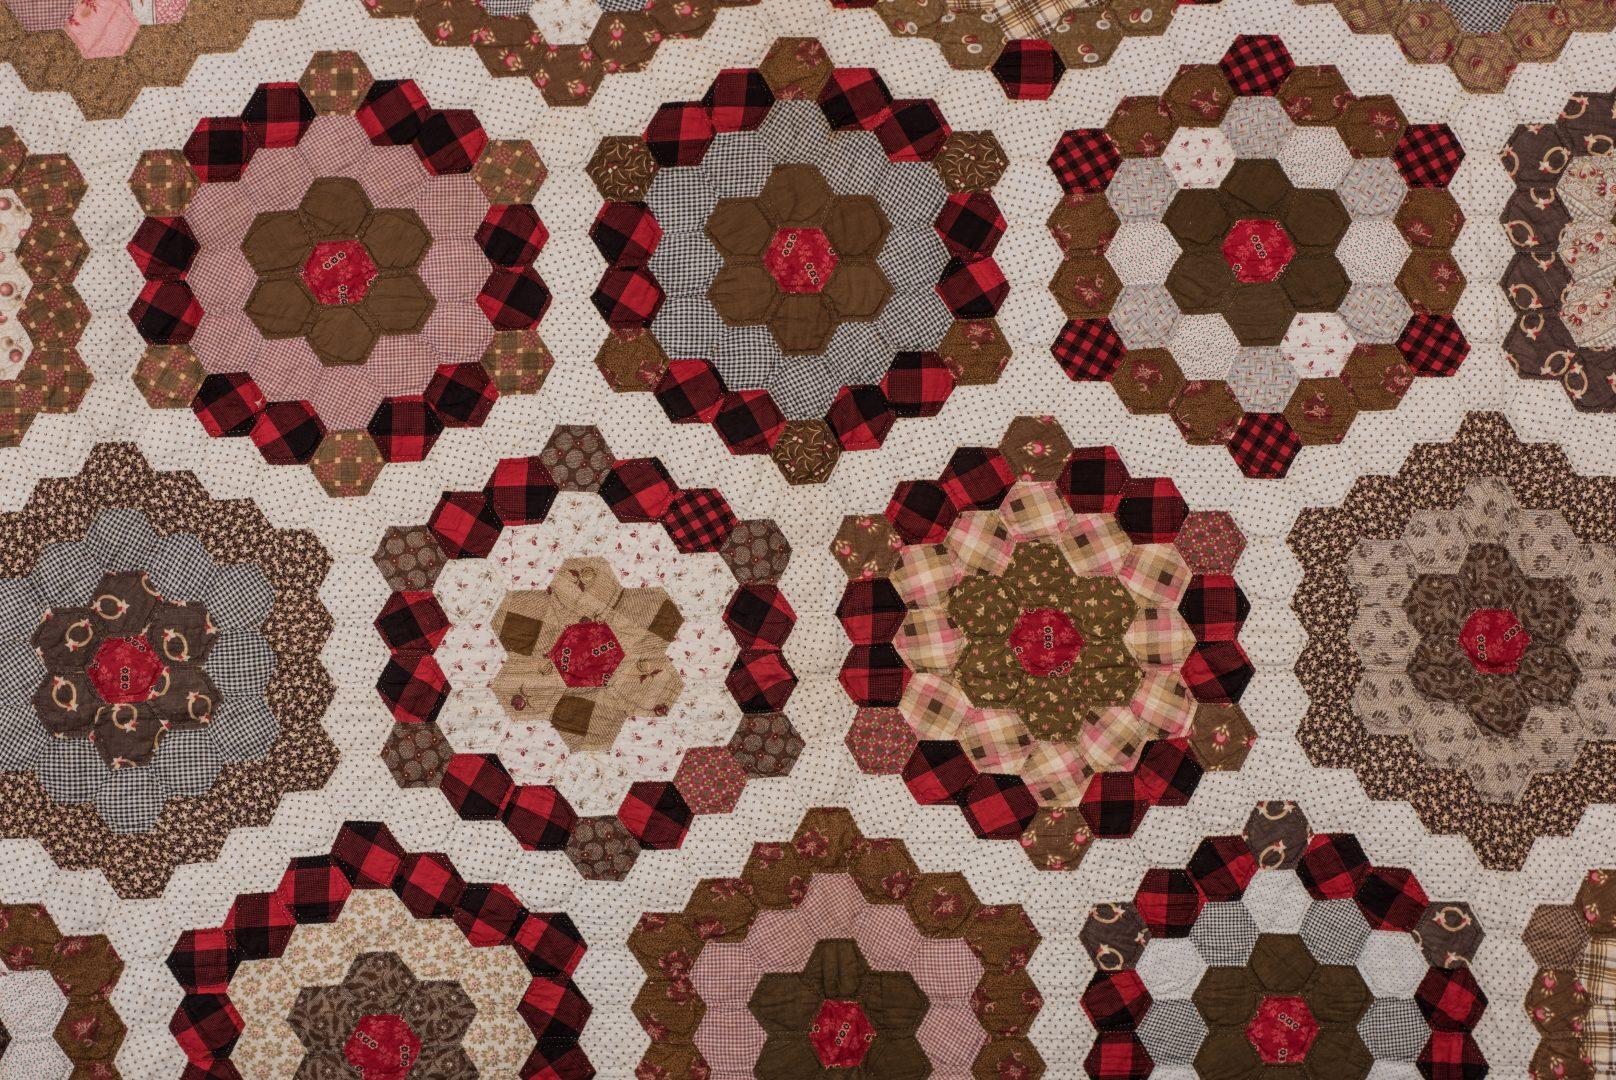 Lot 846: 2 East TN Cotton Piece Quilts